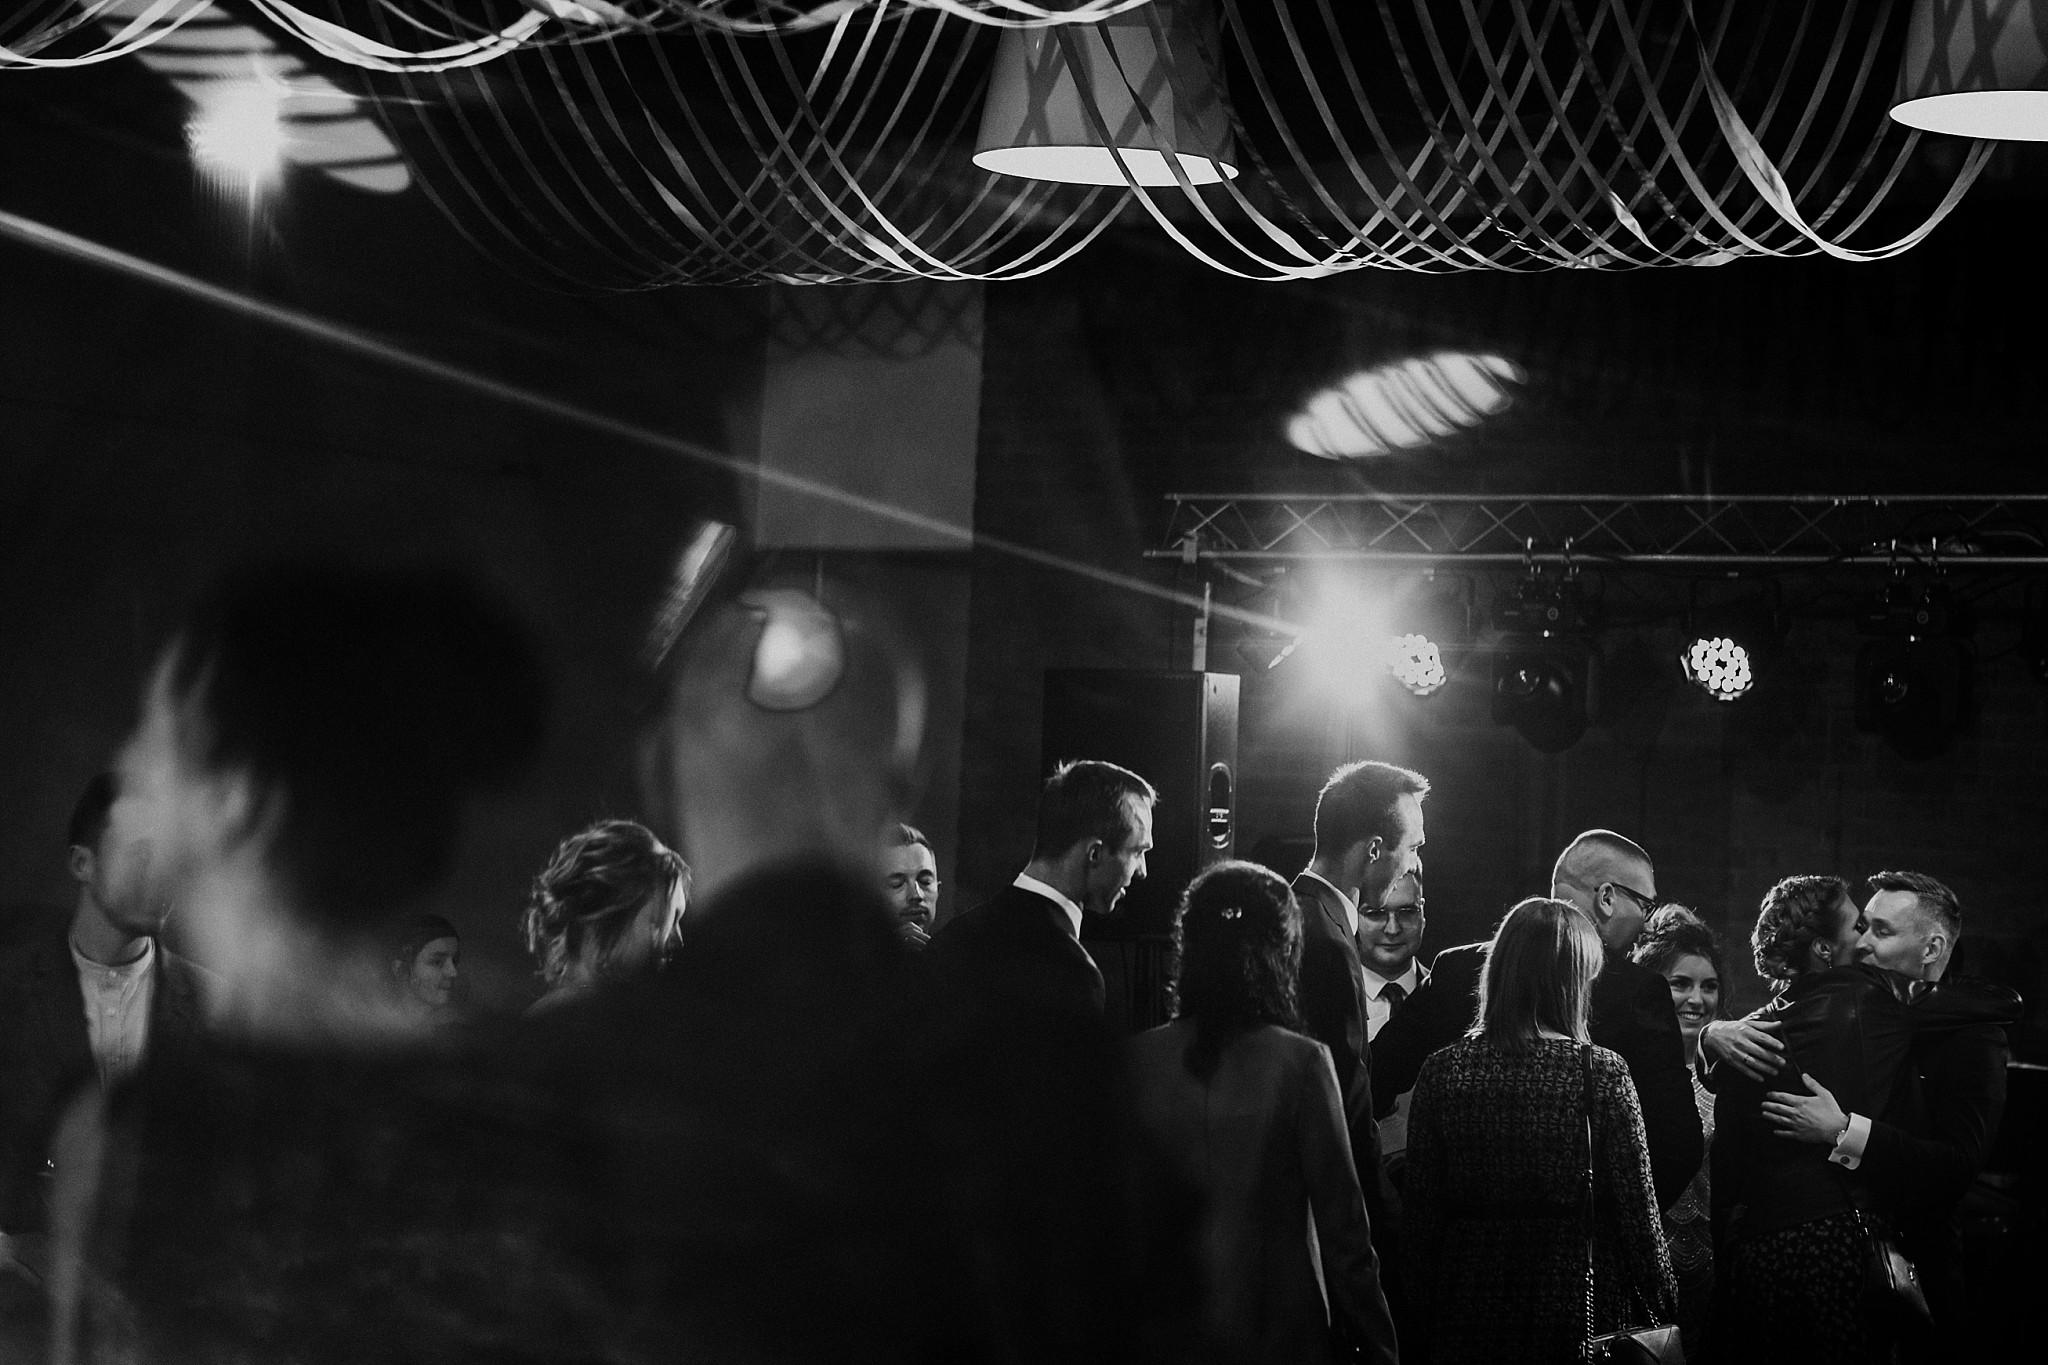 fotograf poznan wesele dobra truskawka piekne wesele pod poznaniem wesele w dobrej truskawce piekna para mloda slub marzen slub koronawirus slub listopad wesele koronawirus 278